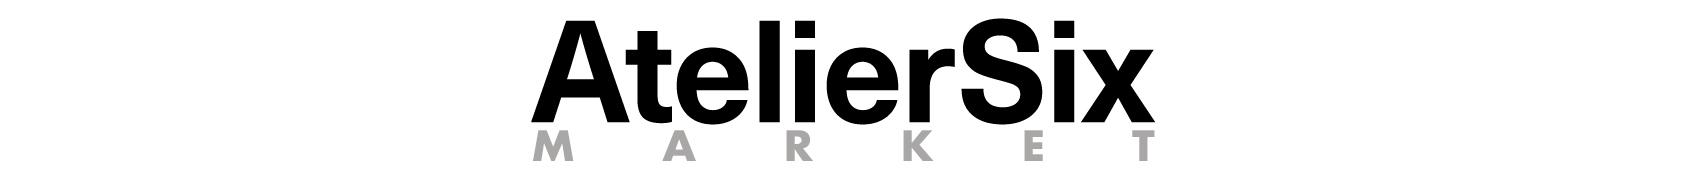 AtelierSix  MARKET